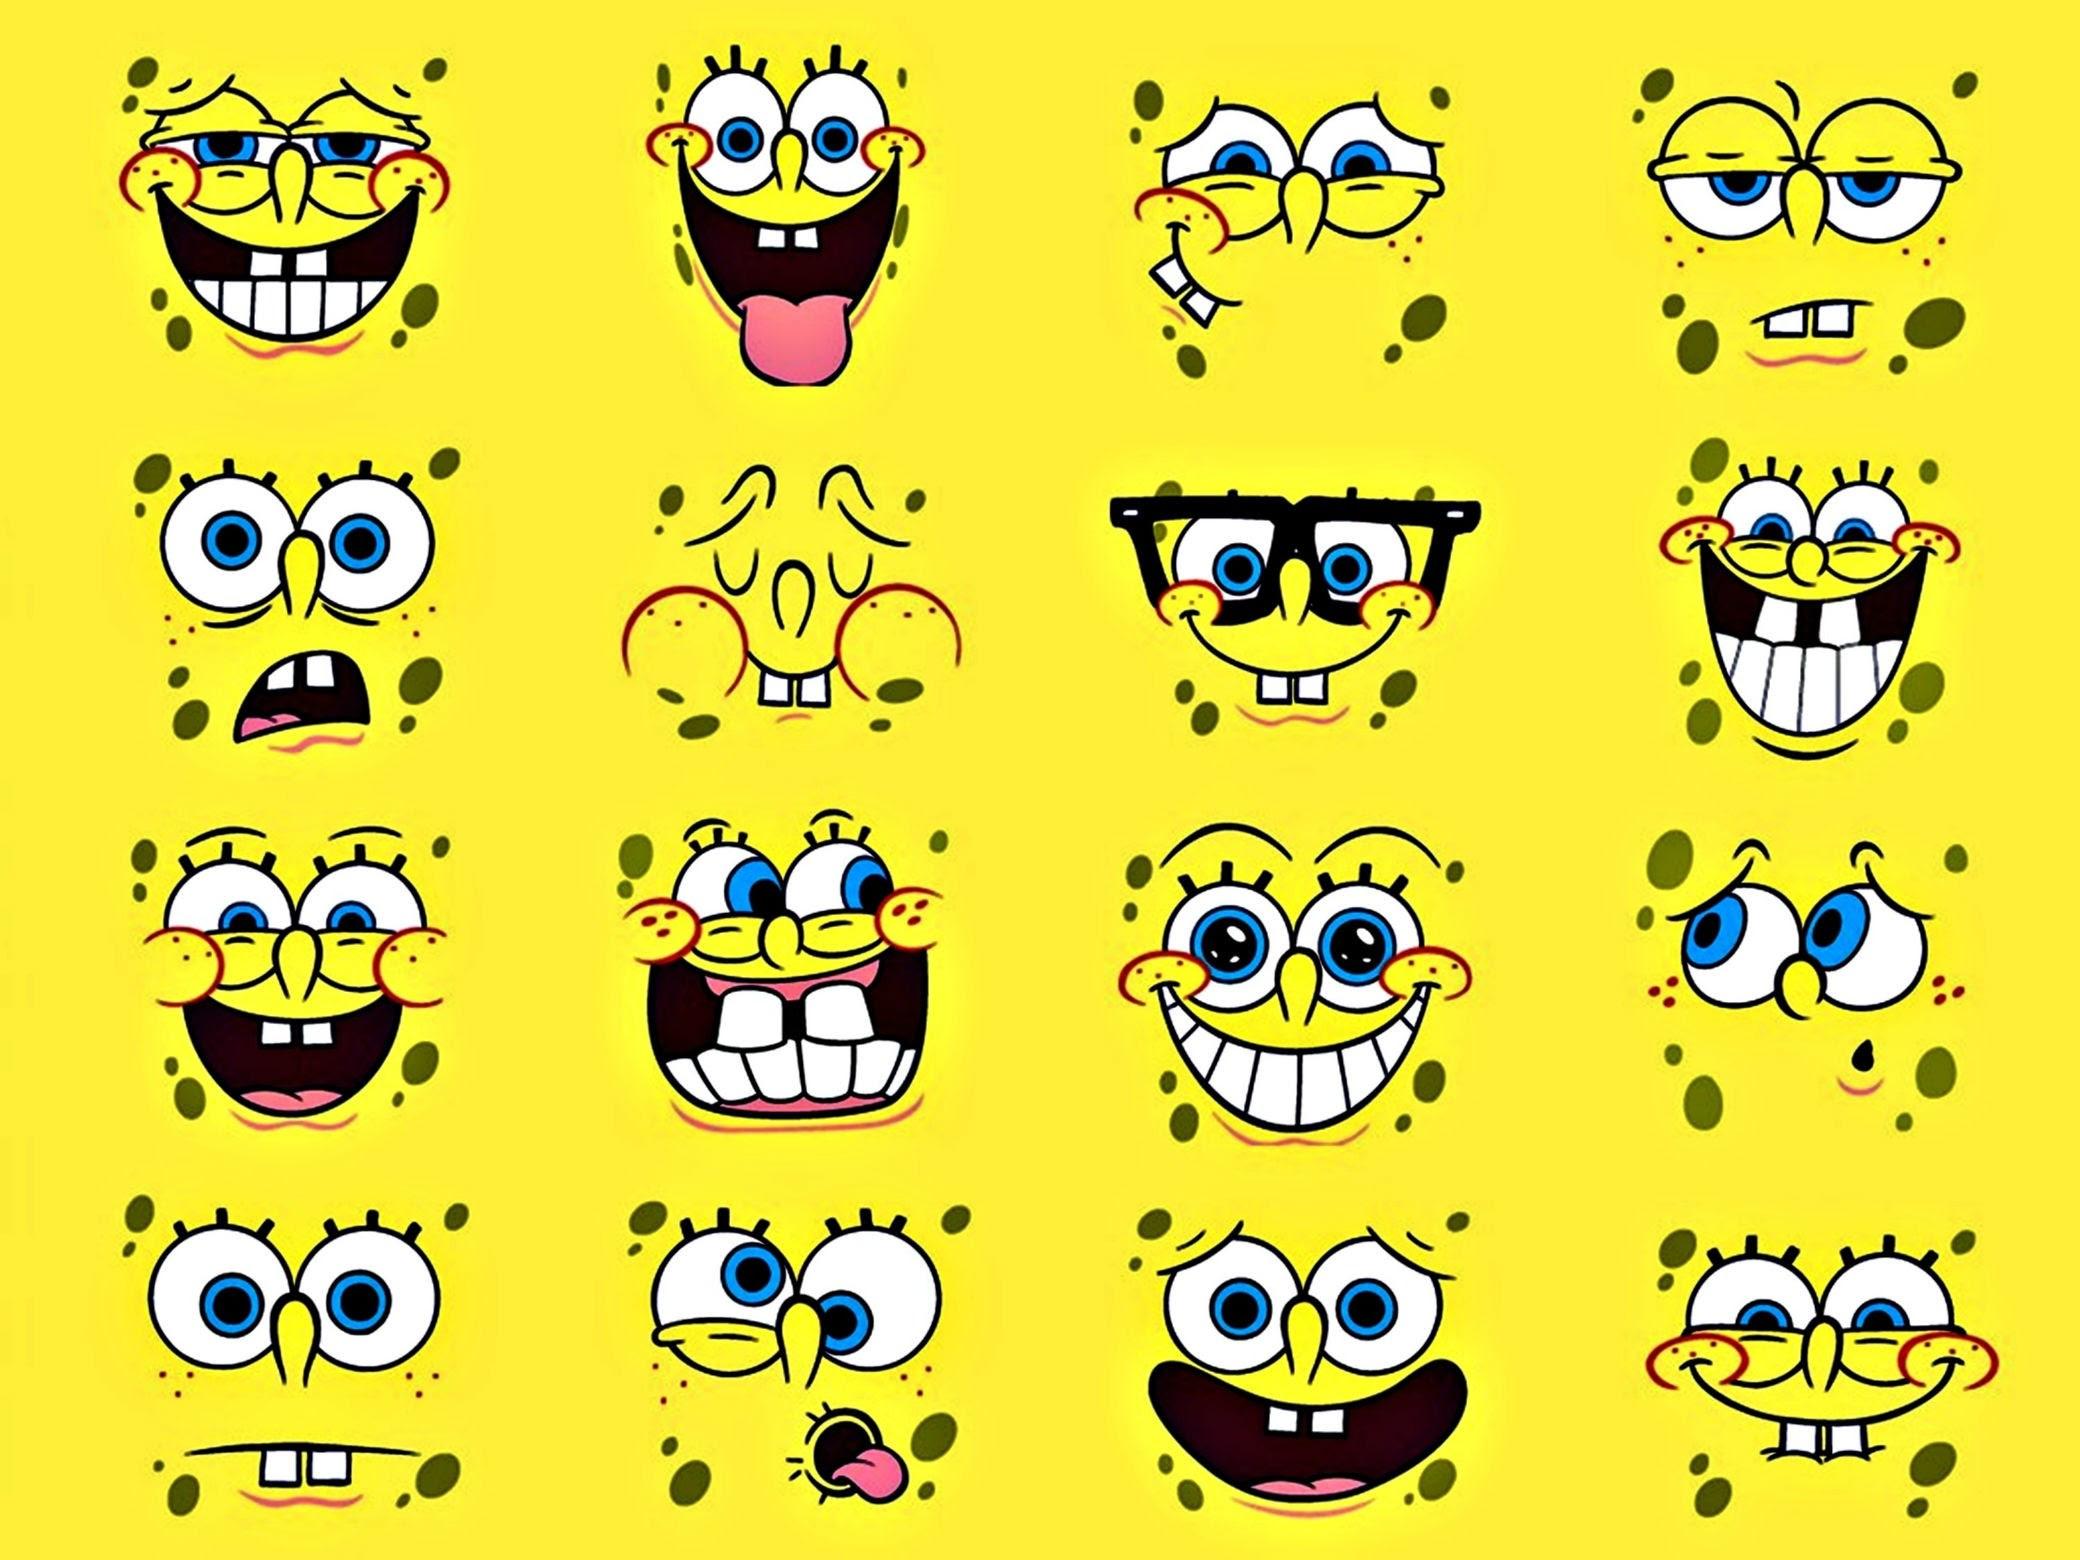 Free Desktop Backgrounds For Spongebob Squarepants